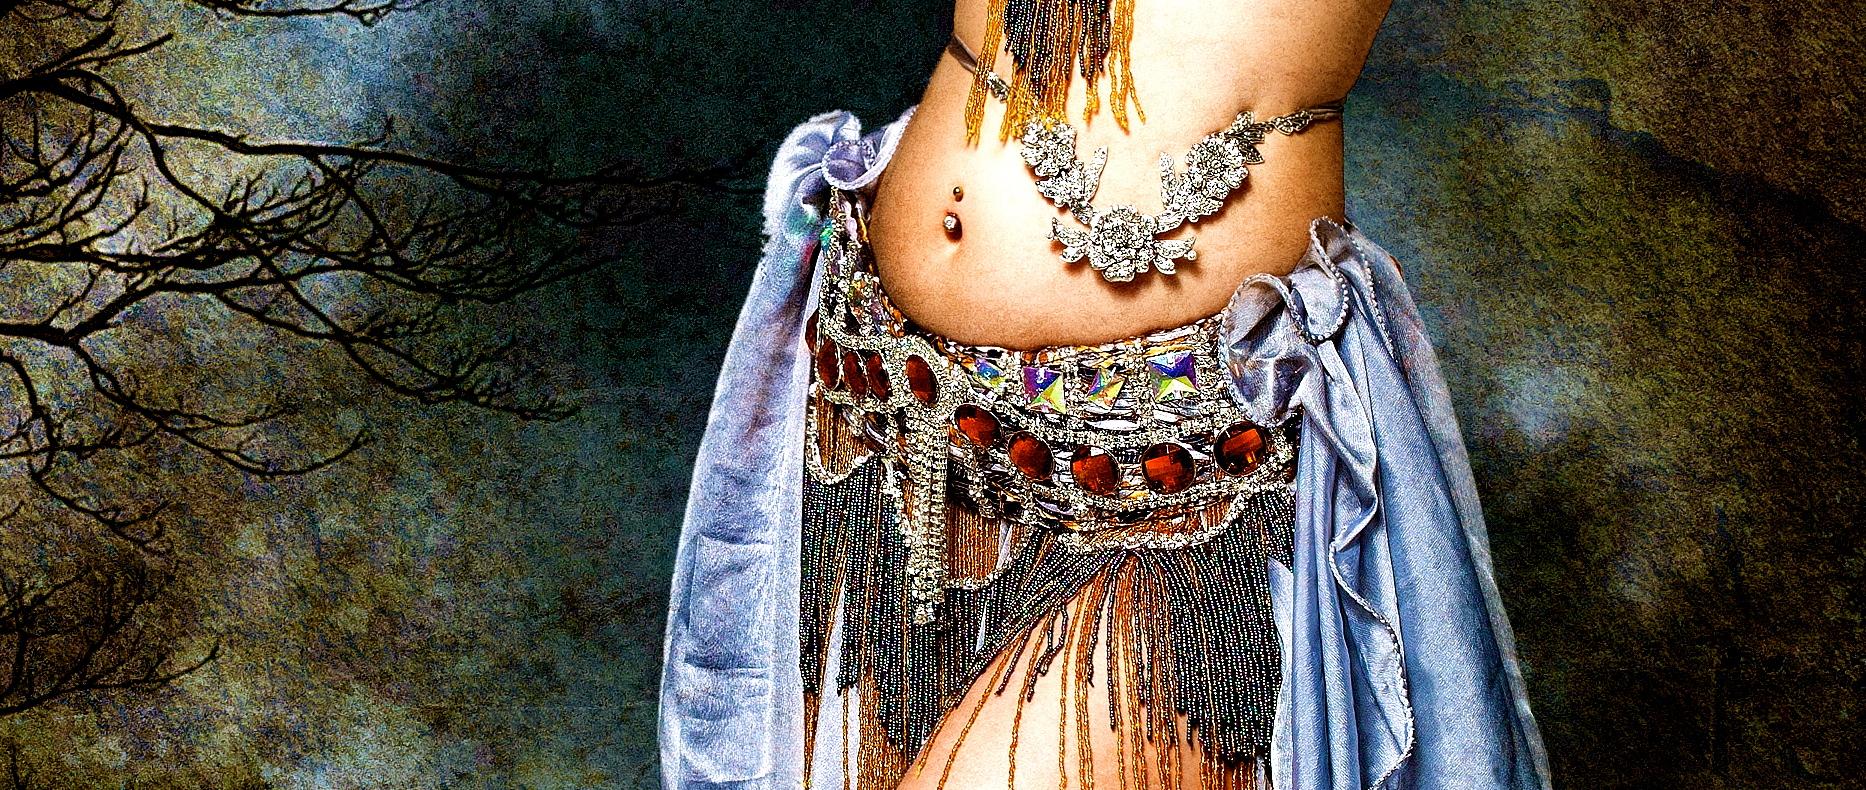 belly dance costumes Melbourne, belly dance Melbourne, Belly Dancer Melbourne, belly dancer, hire a belly dancer Melbourne